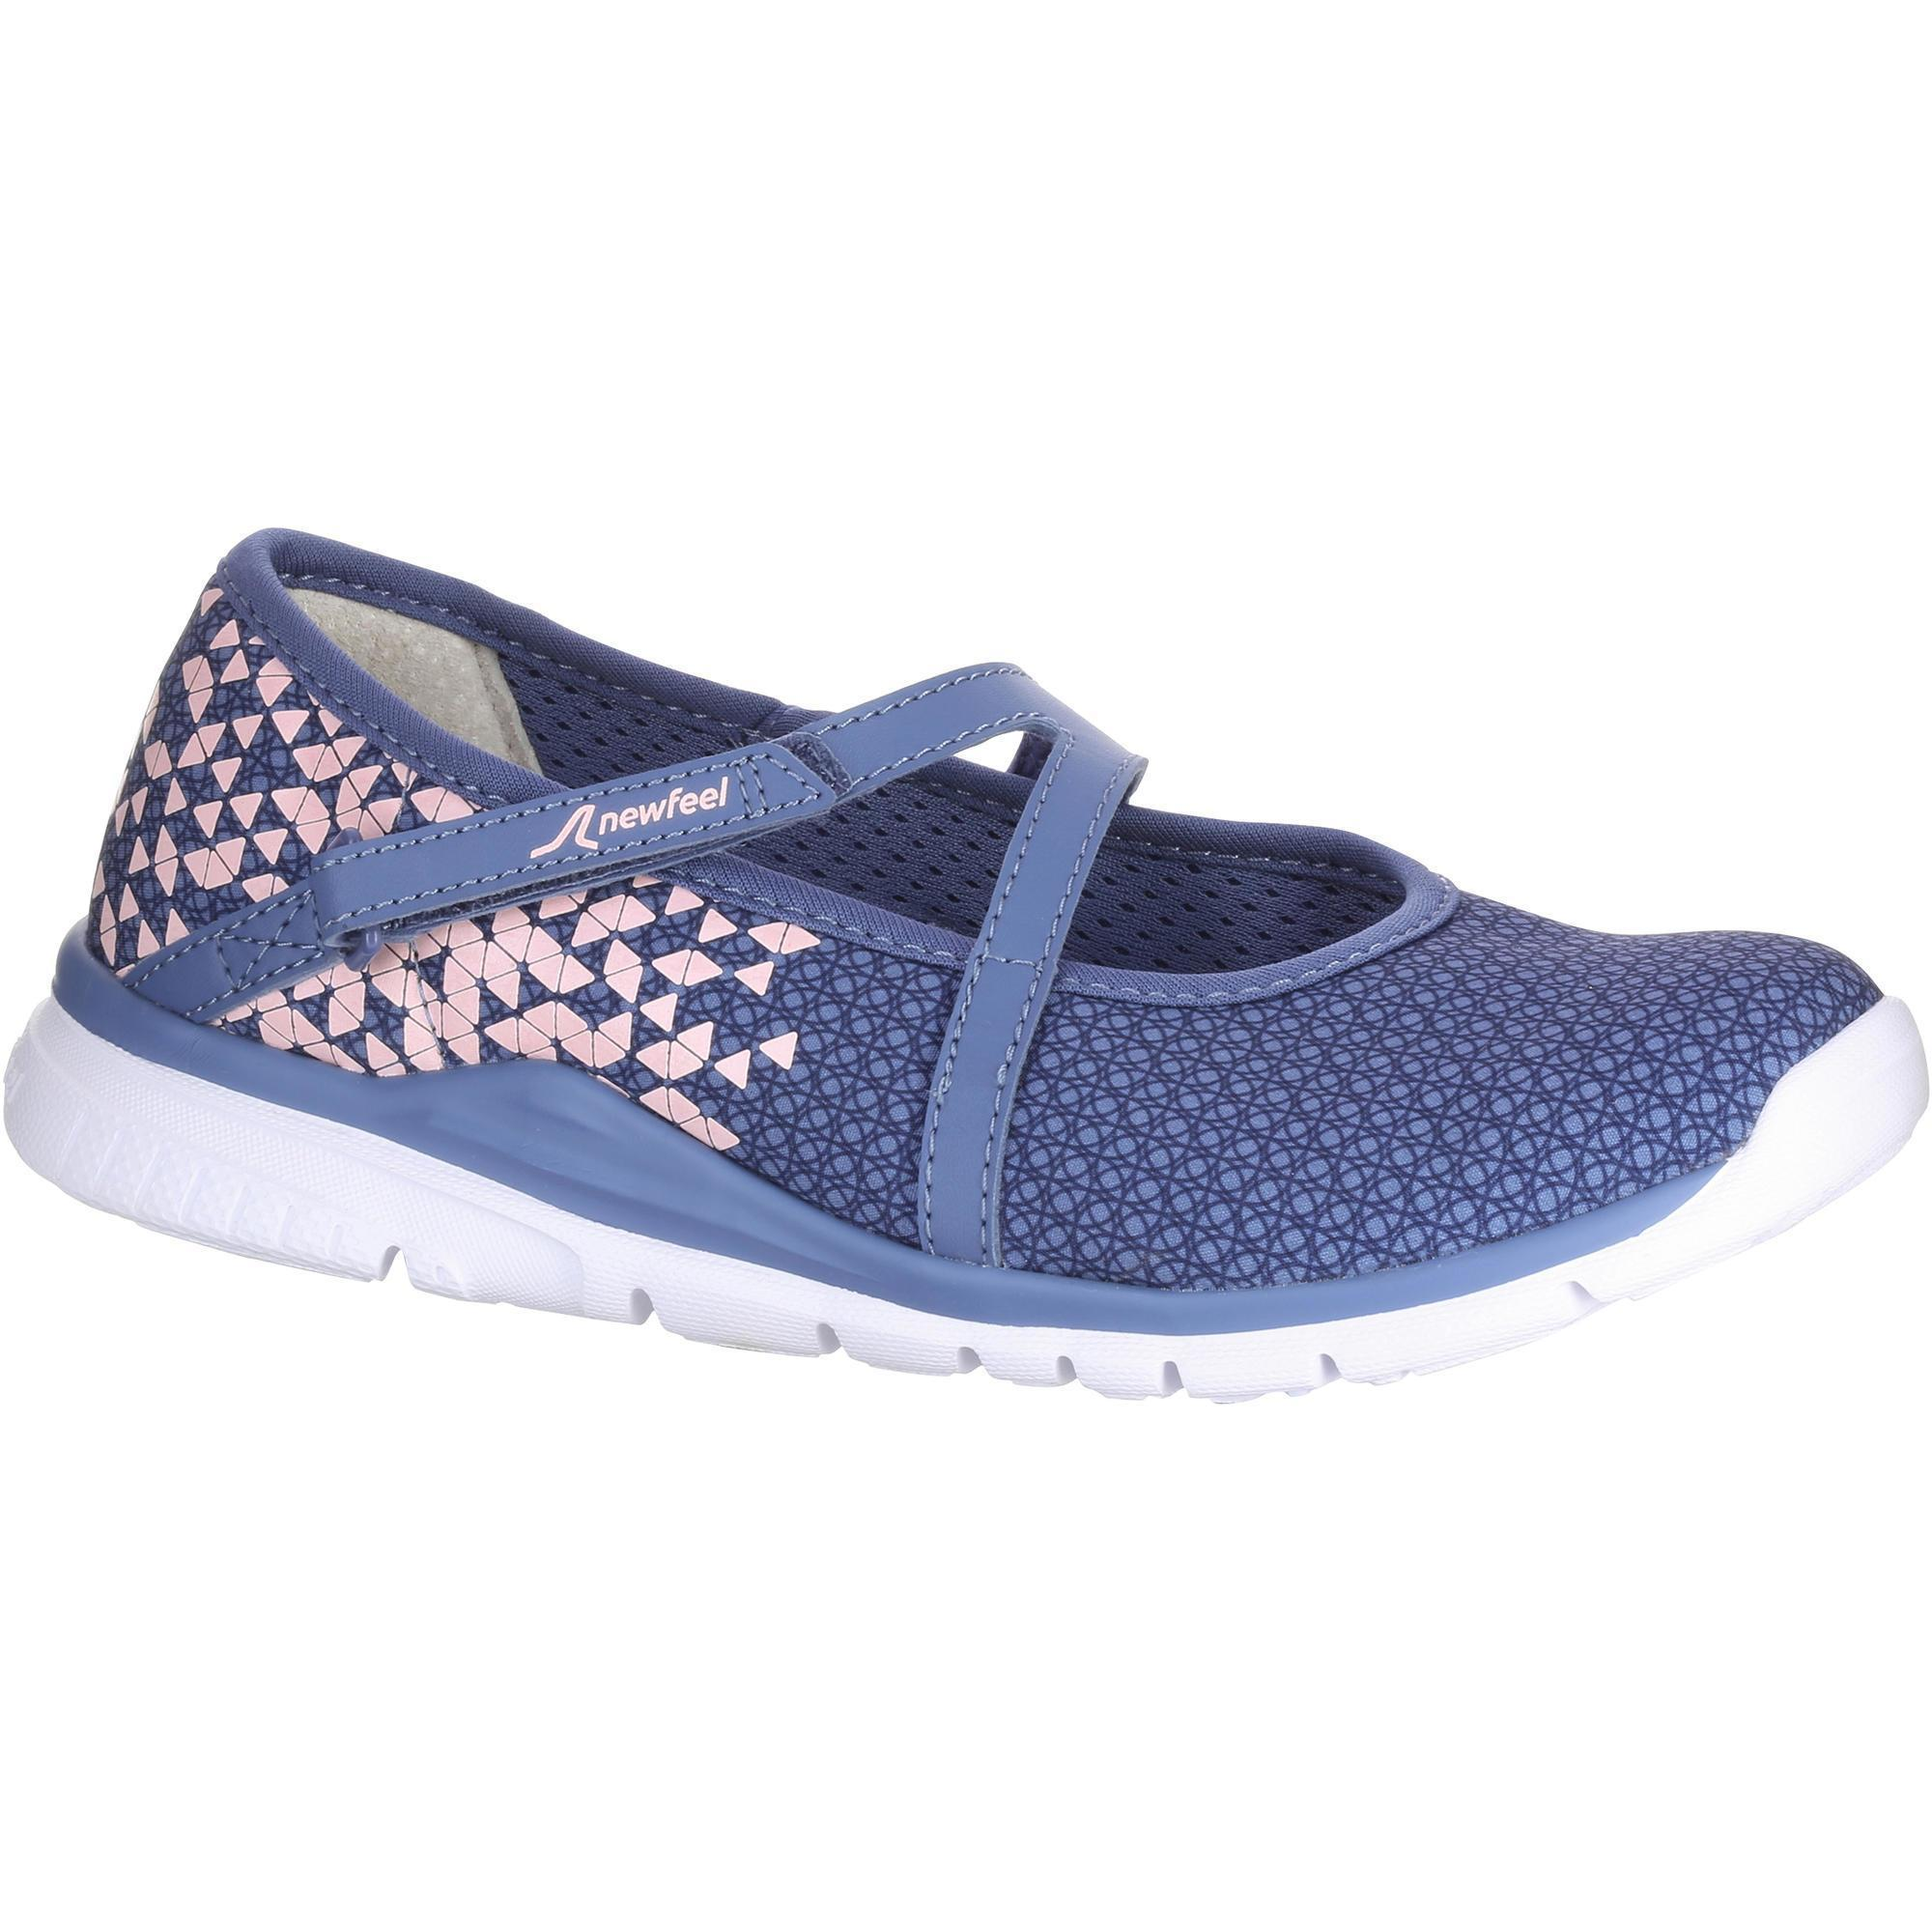 ec4b6bea9dbfe chaussure newfeel fille